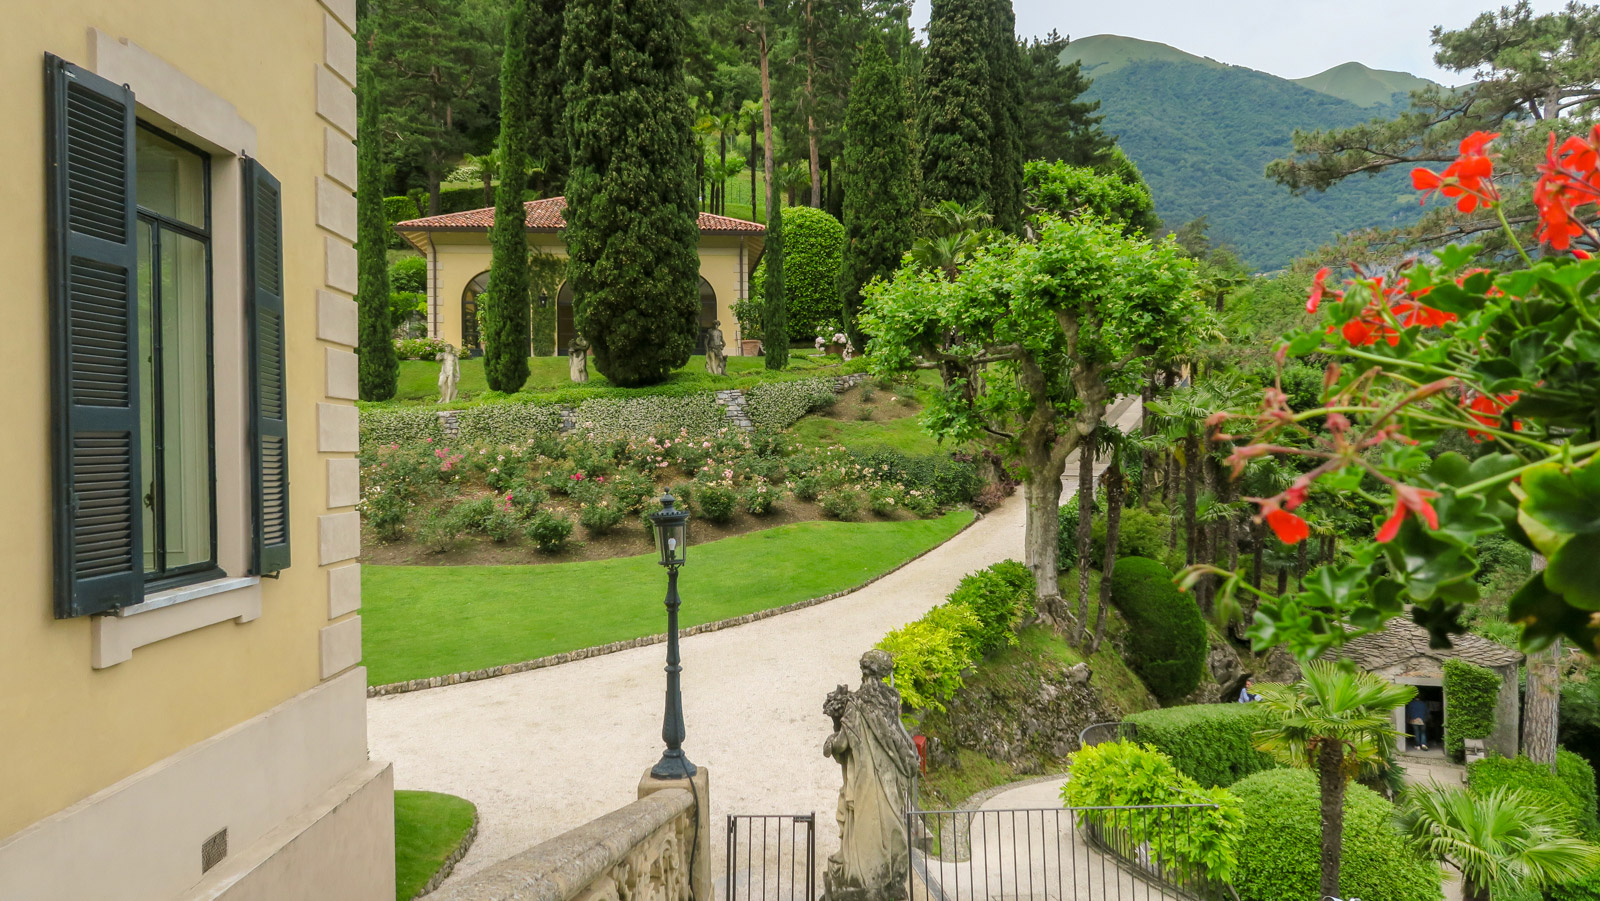 Villa Balbianello, Tuinen, Comomeer, Lenno